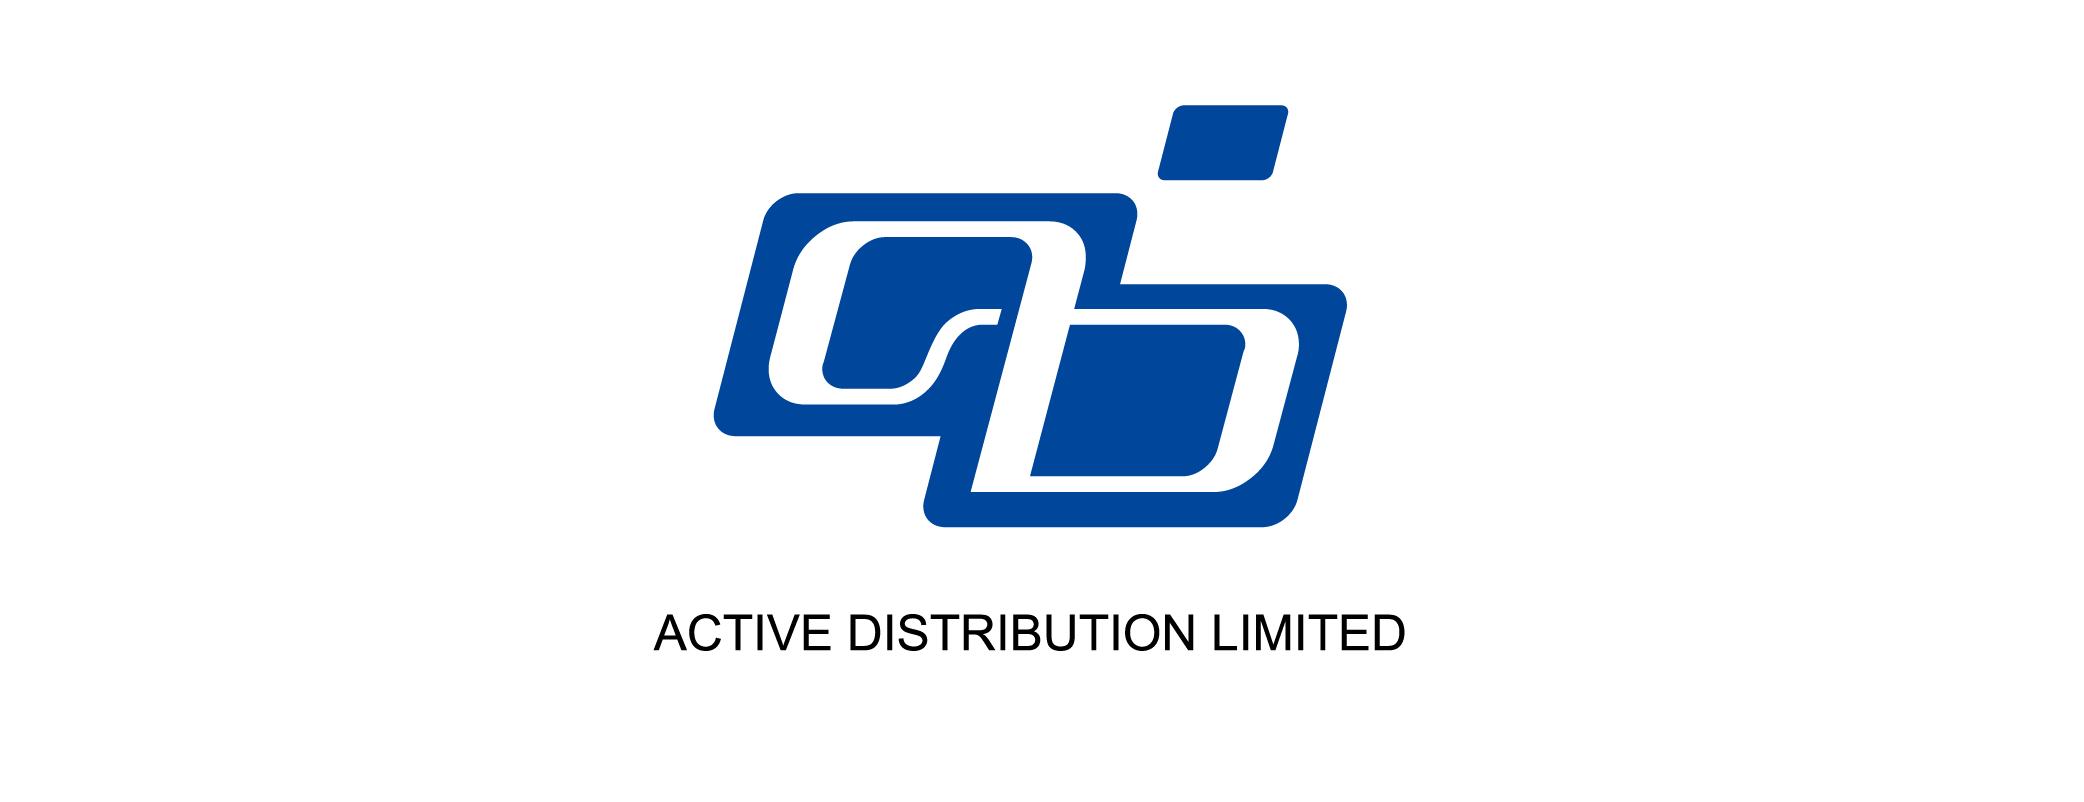 Active Distribution Ltd.